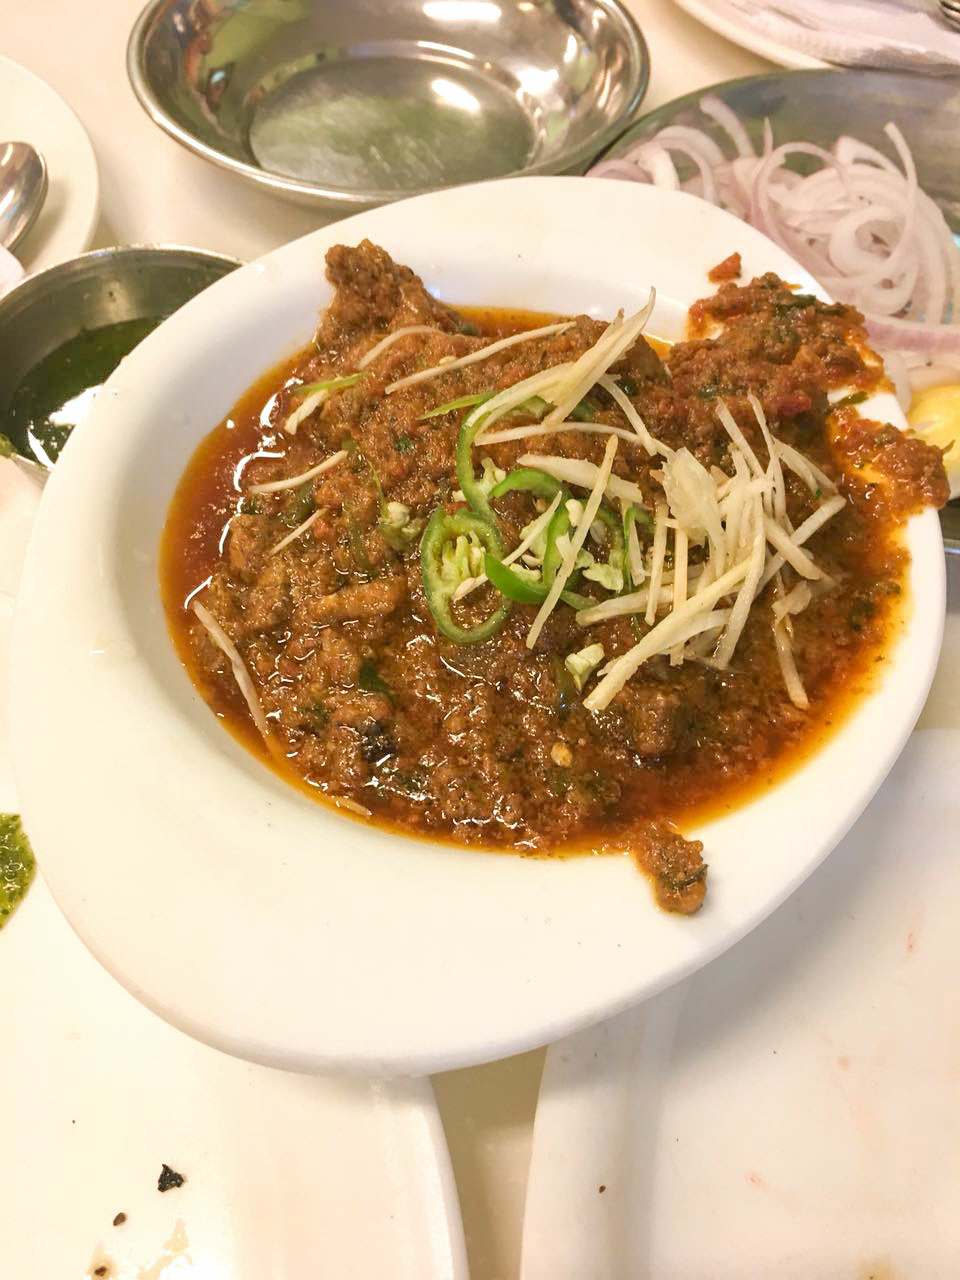 Karims restaurant, Delhi, the famed Mutton Korma